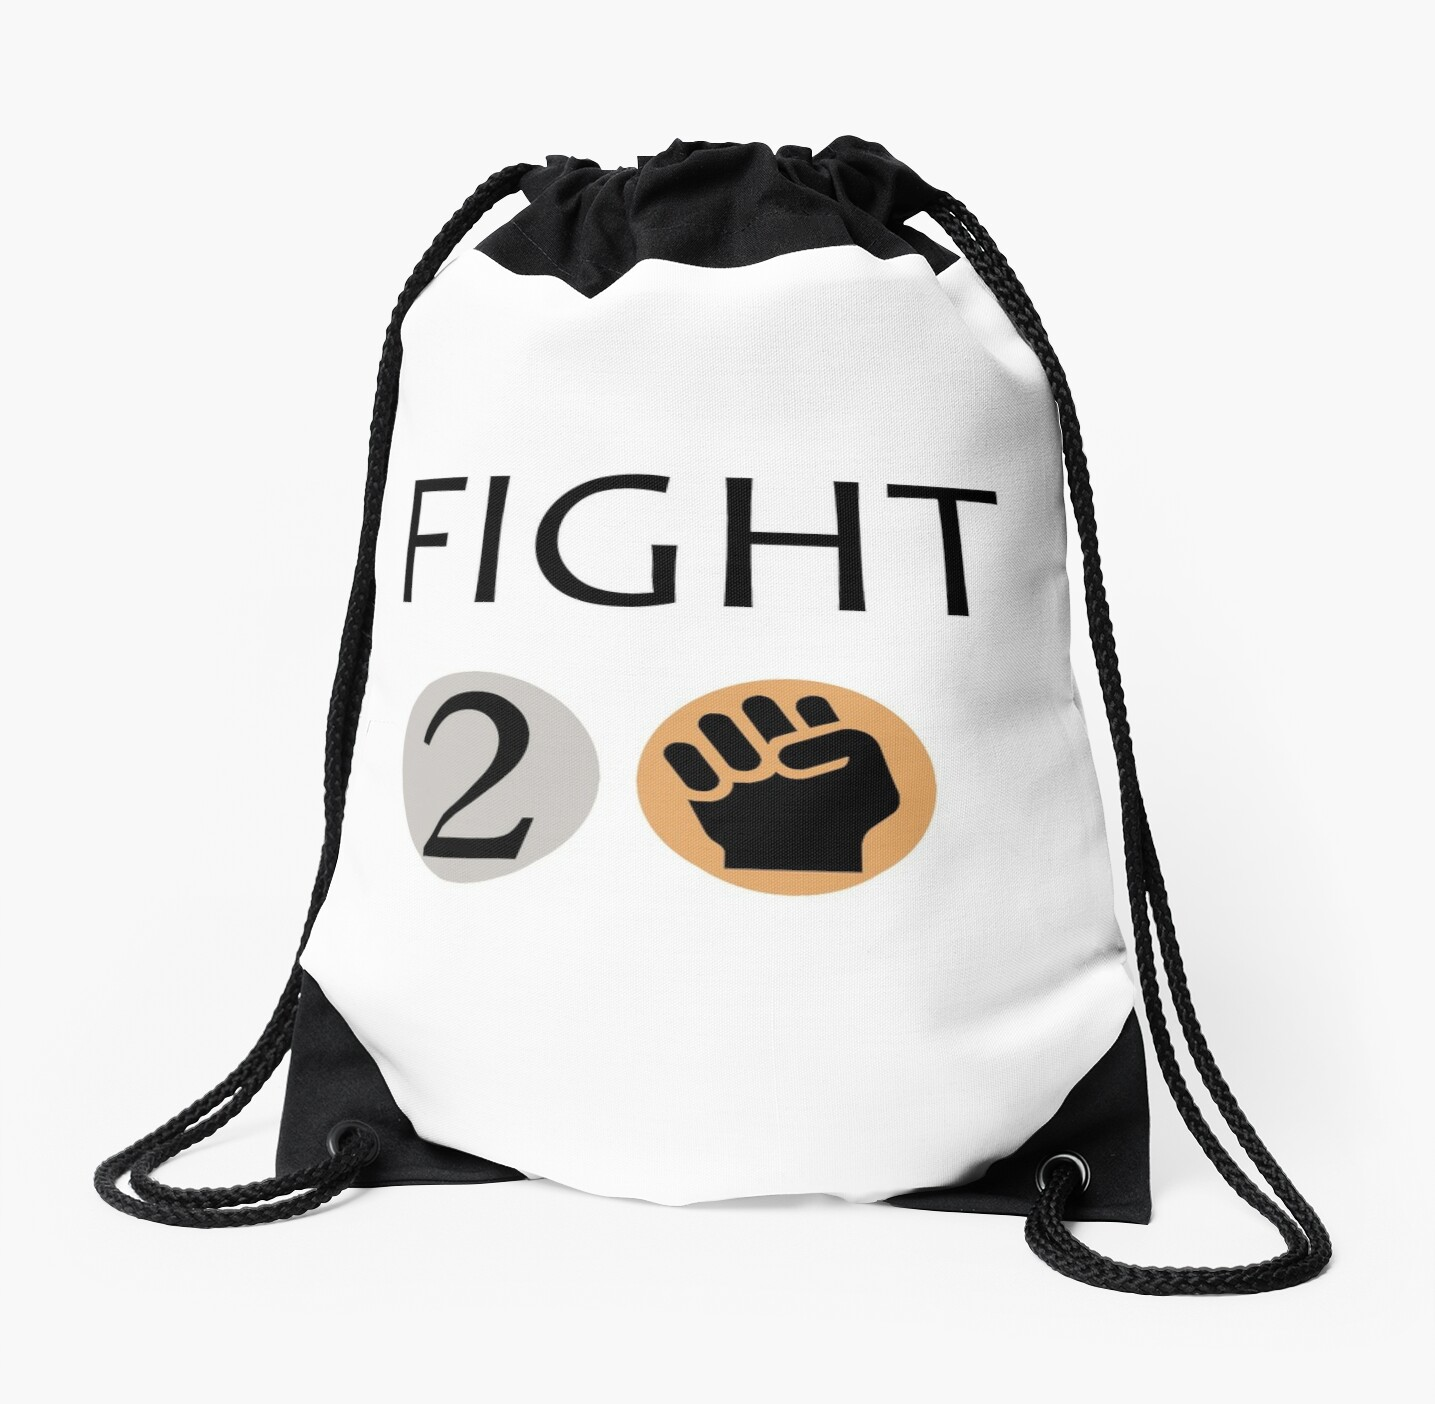 FIGHT by crackeraisle